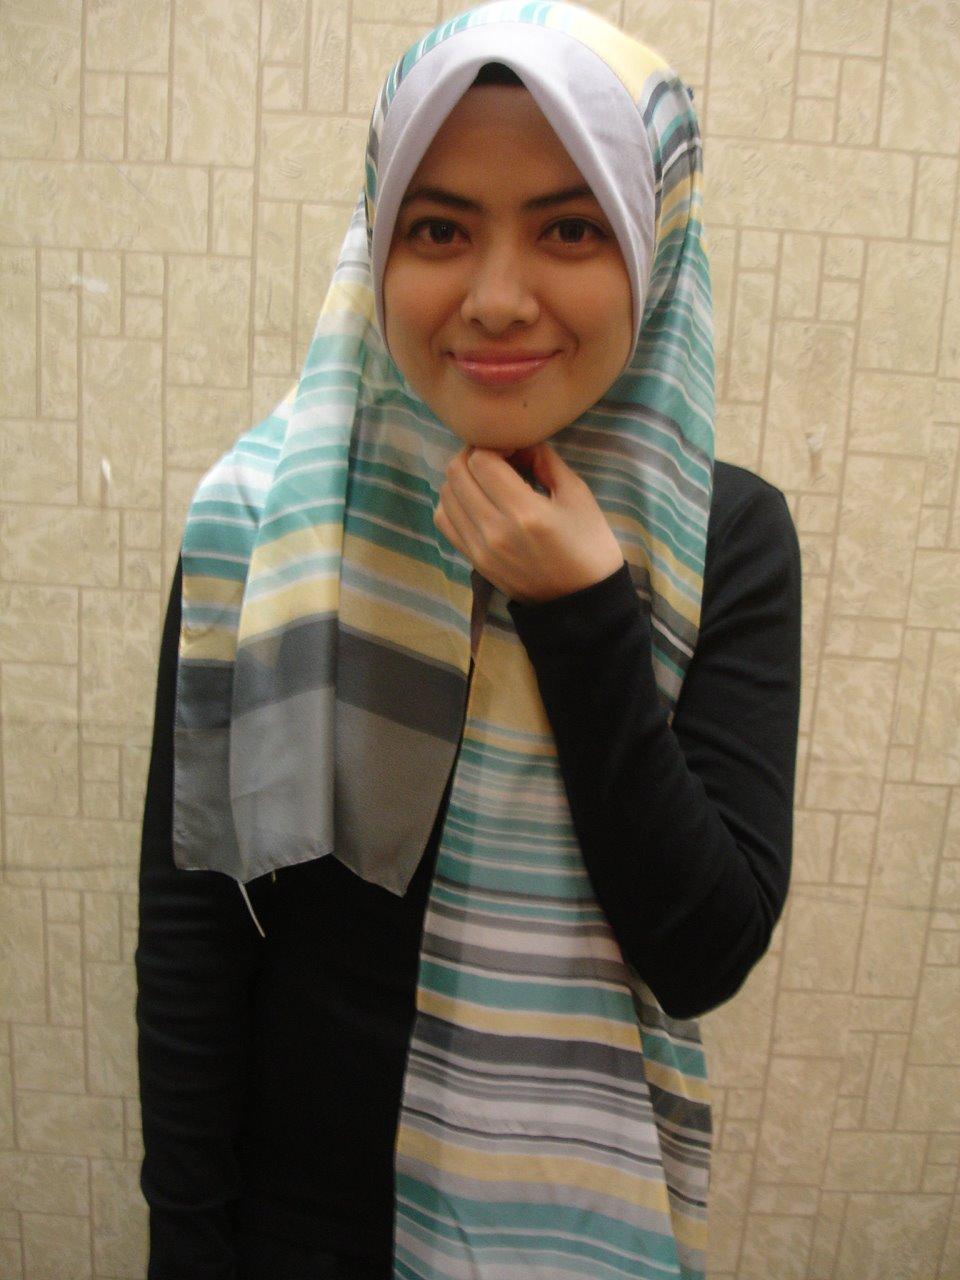 Malay Skodeng Tudung Hijab Labuh Romen - Datin Rosmah -1765